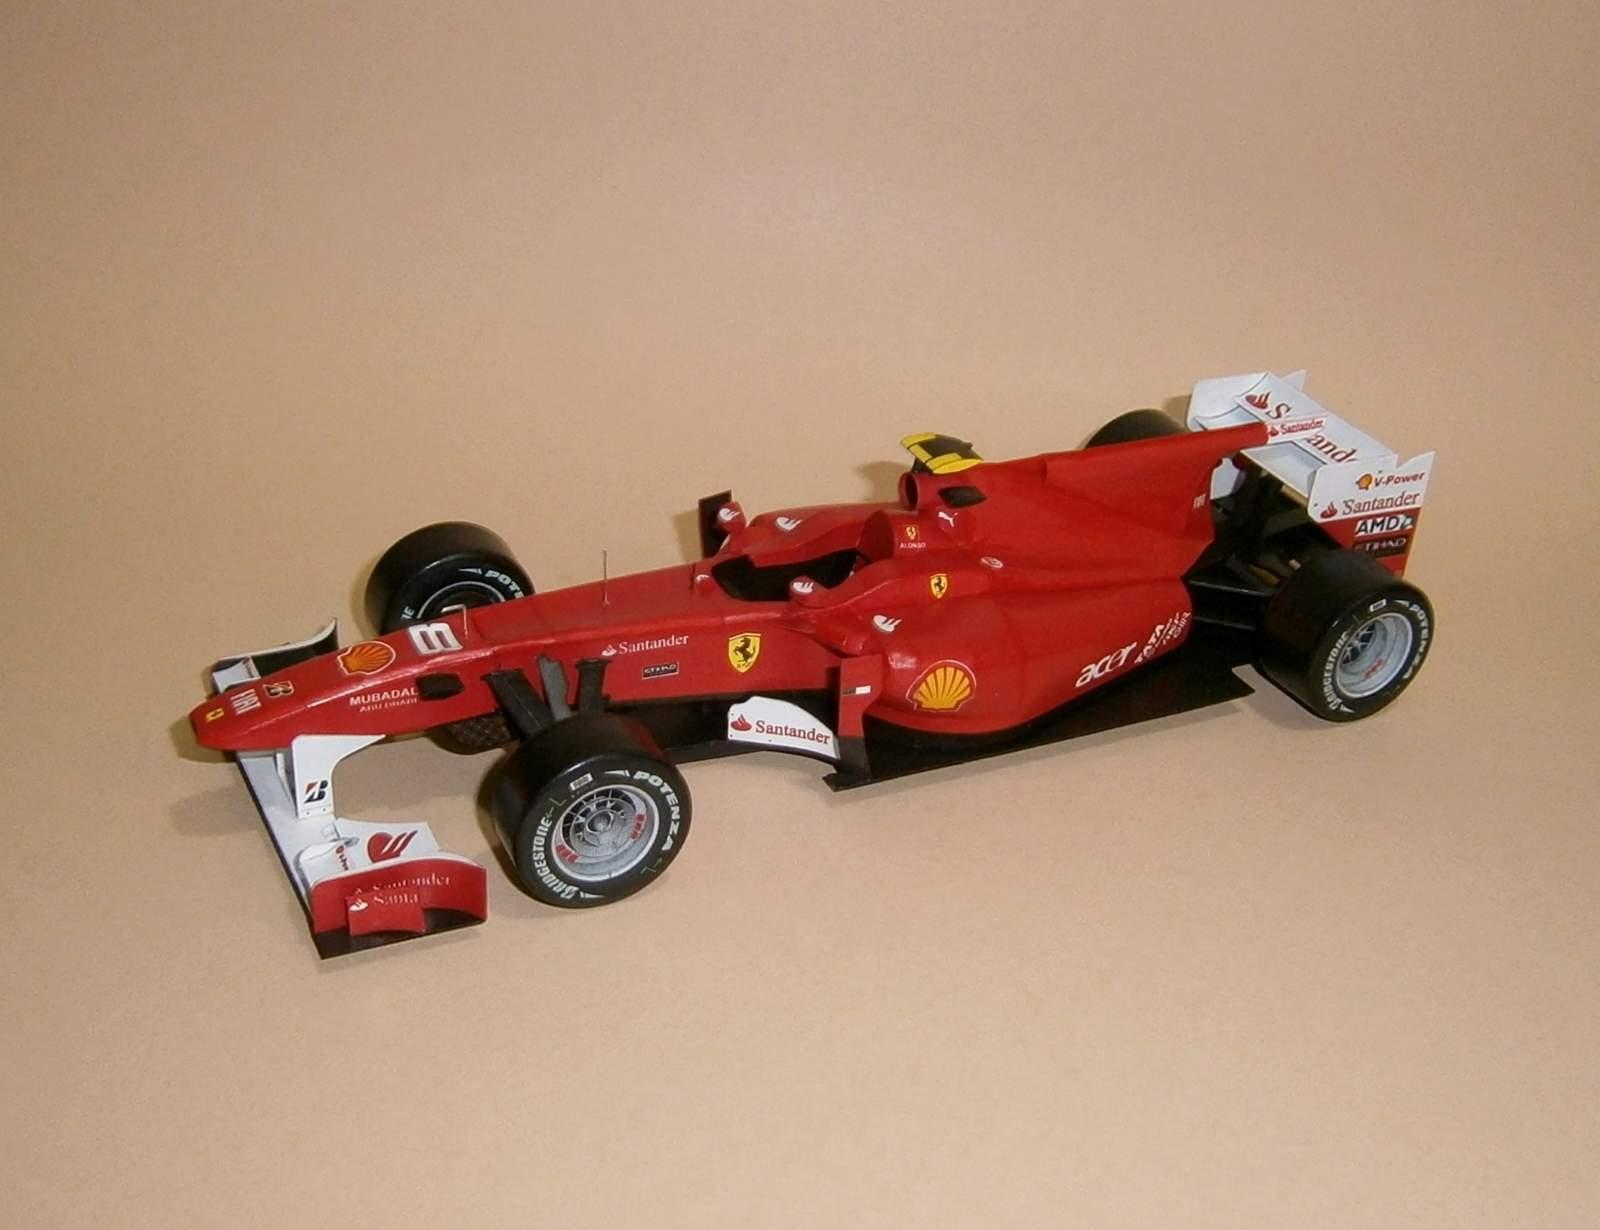 Ferrari F10 - F.Alonso, GP Italy 2010